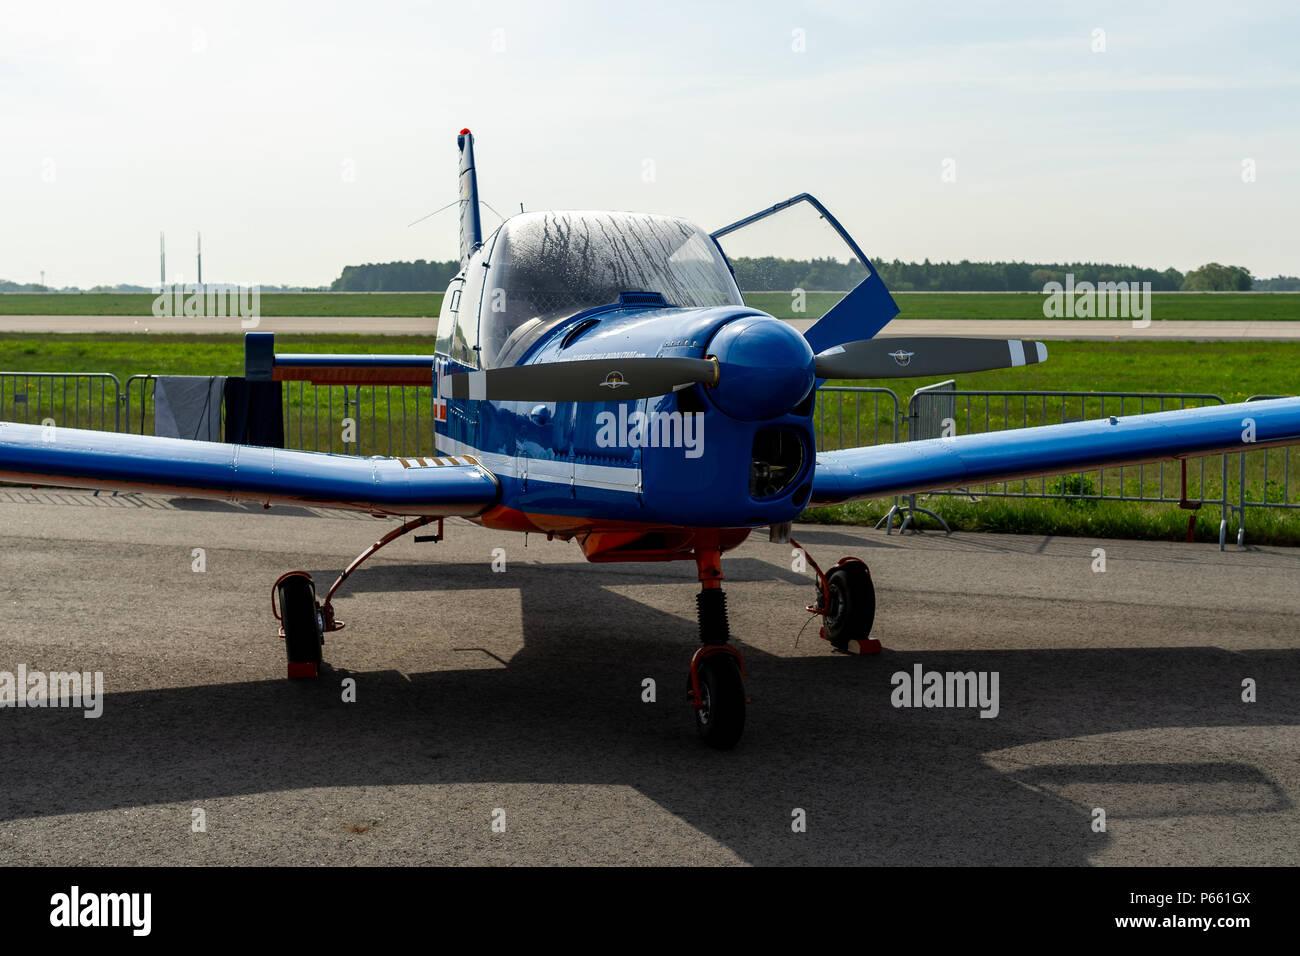 BERLIN - APRIL 27, 2018: Czech four-seat light trainer / touring aircraft Zlin Z43. Exhibition ILA Berlin Air Show 2018. - Stock Image